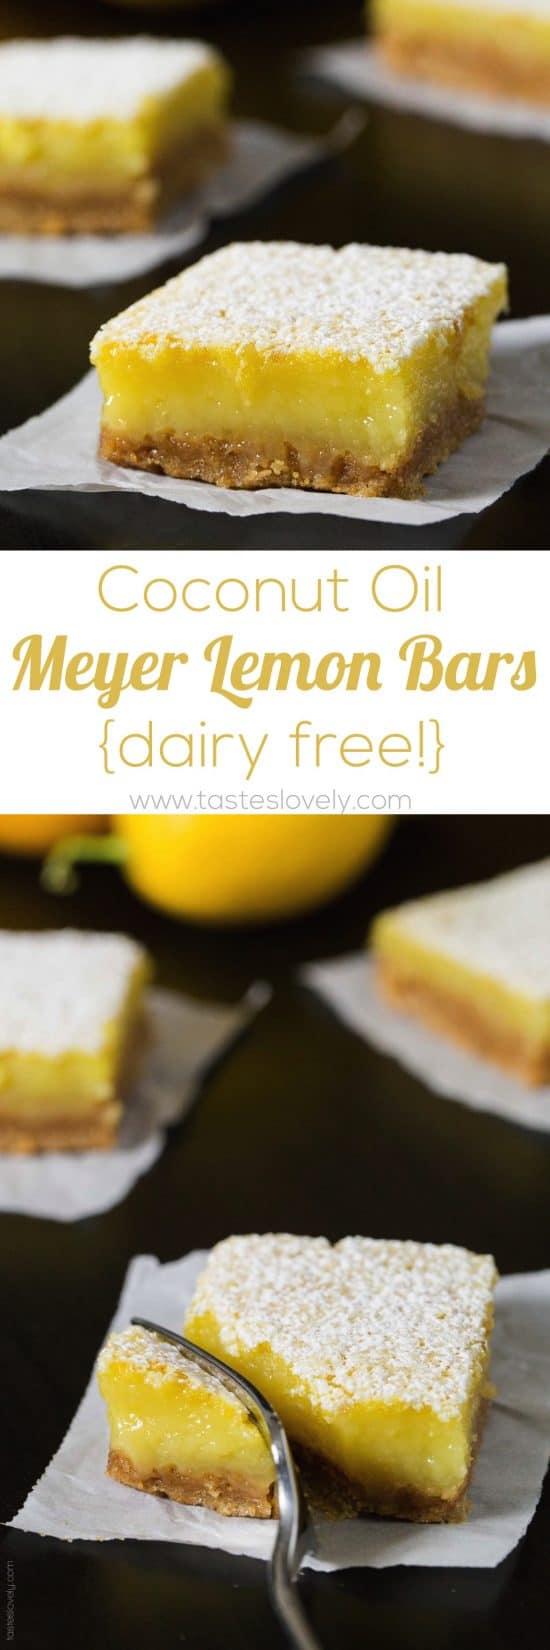 Coconut Oil Meyer Lemon Bars - a healthier and dairy free lemon bar!